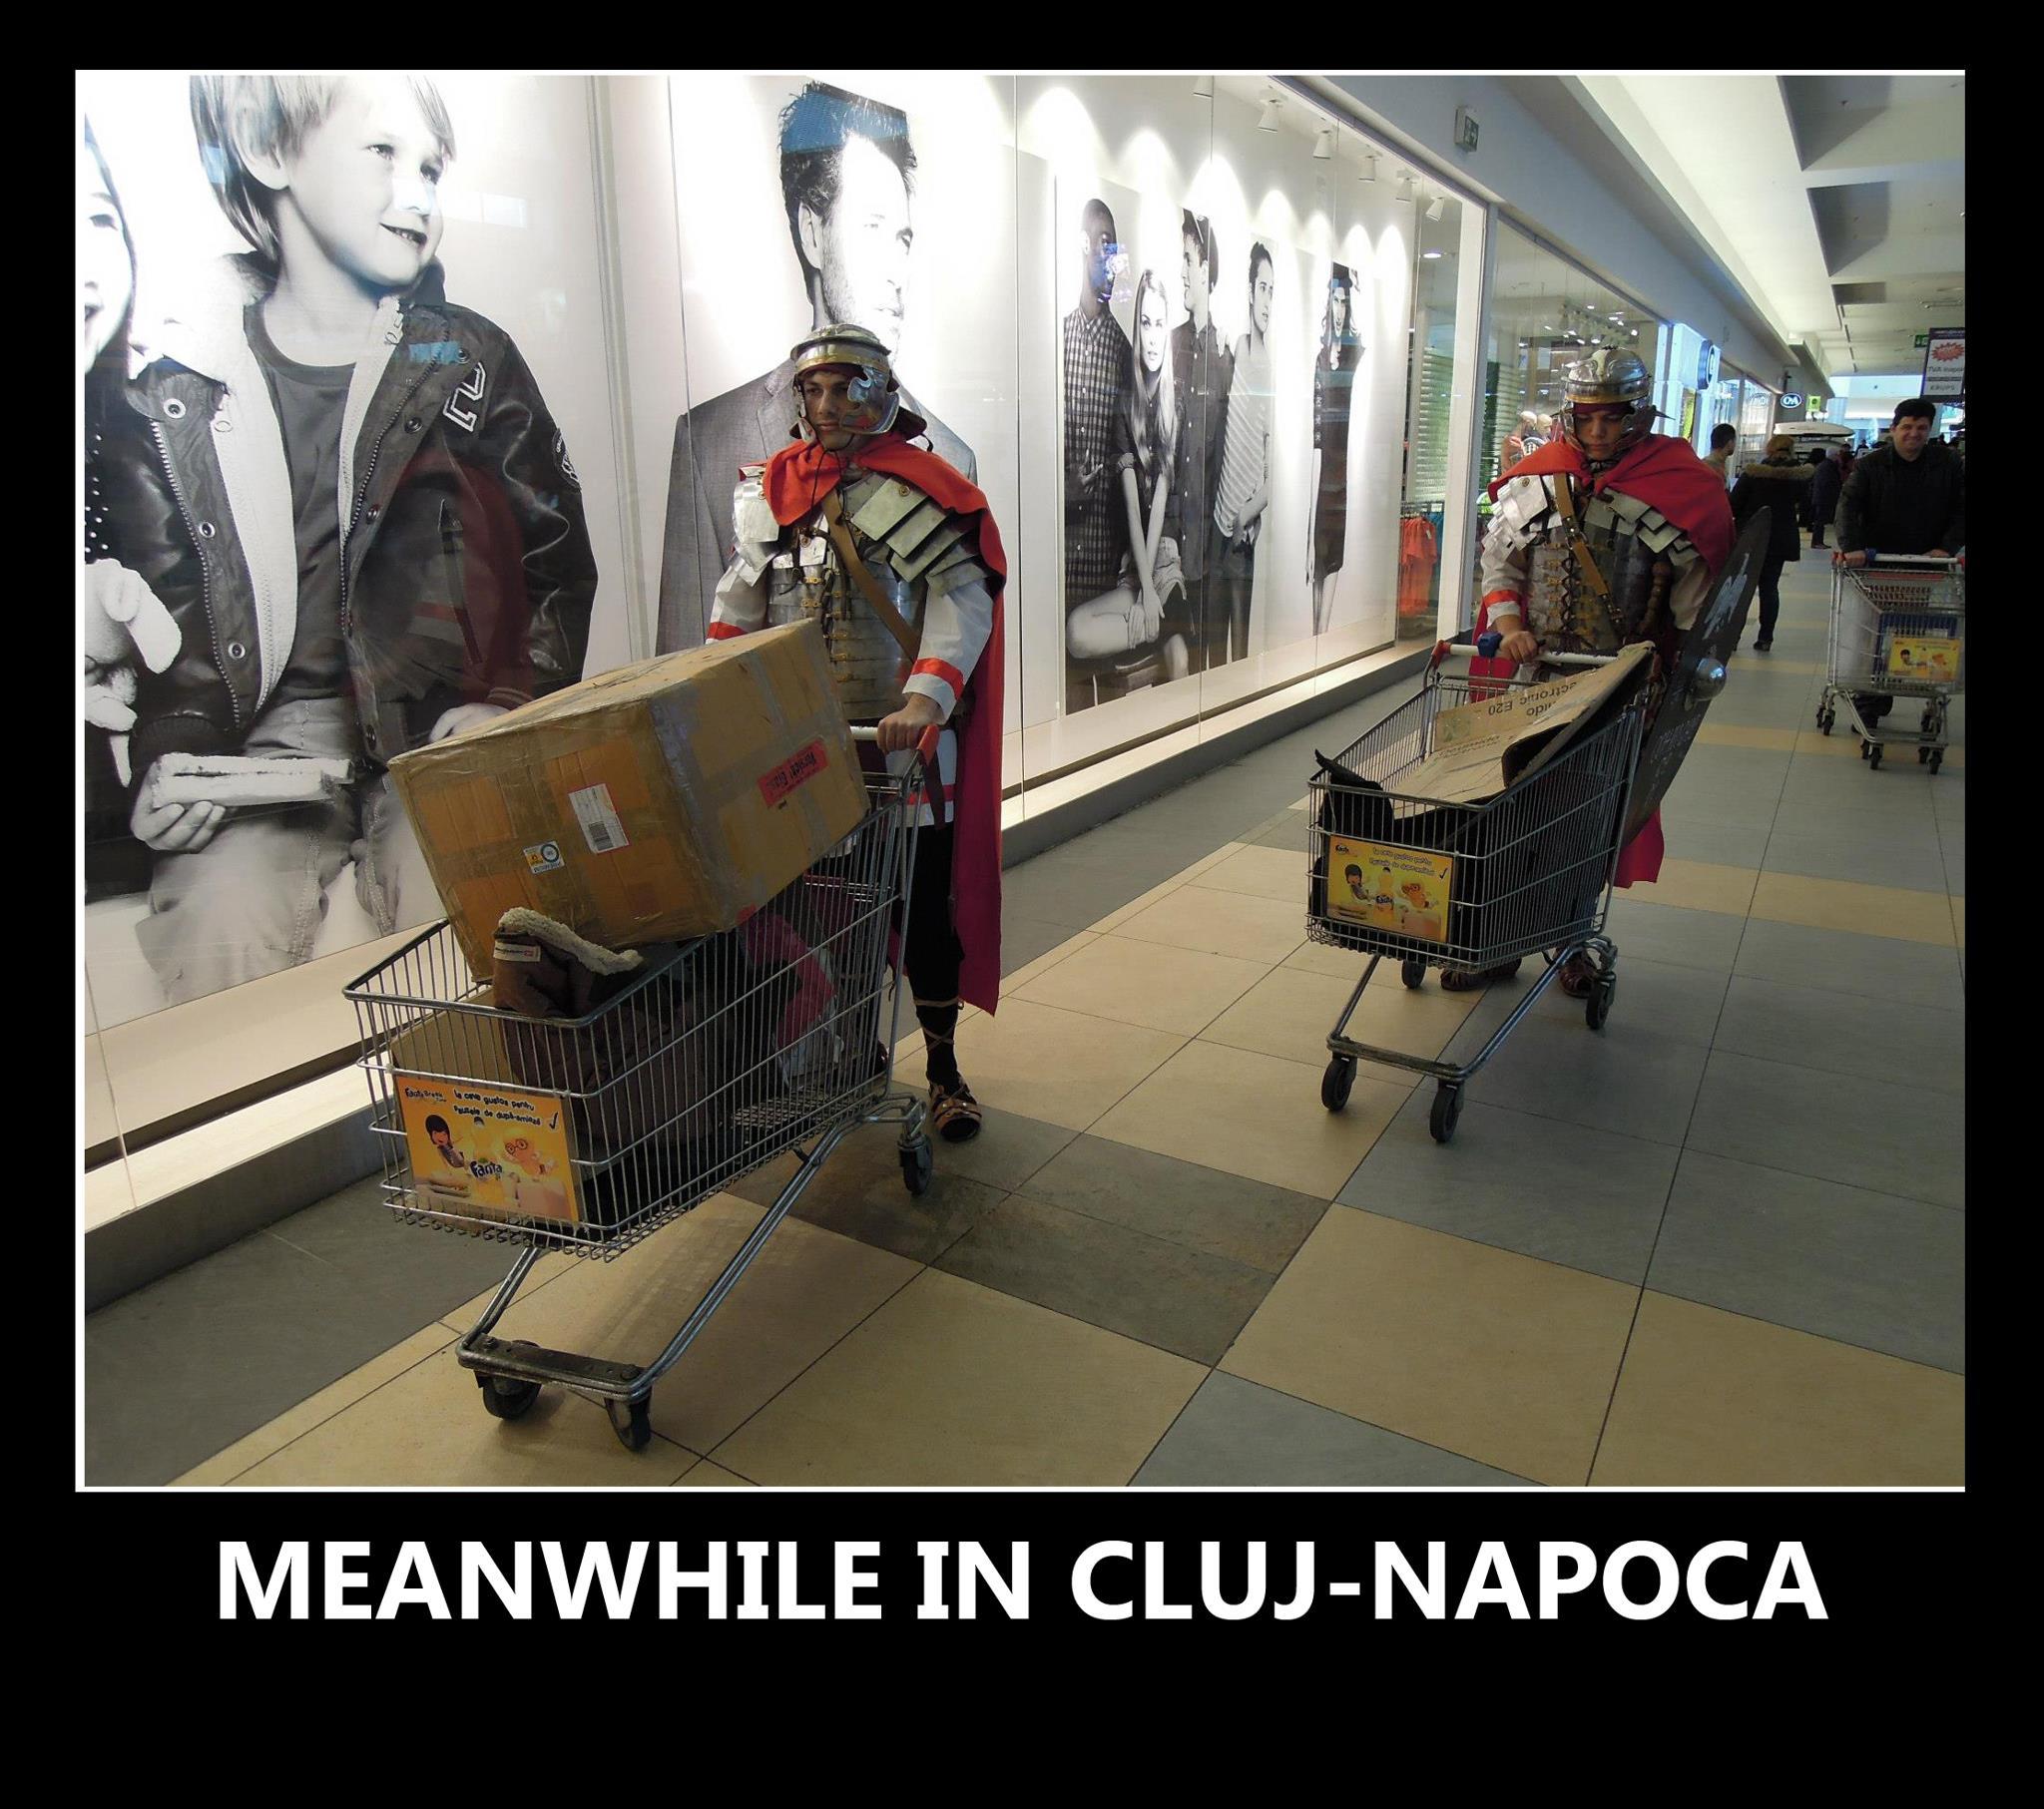 Meanwhile la Cluj